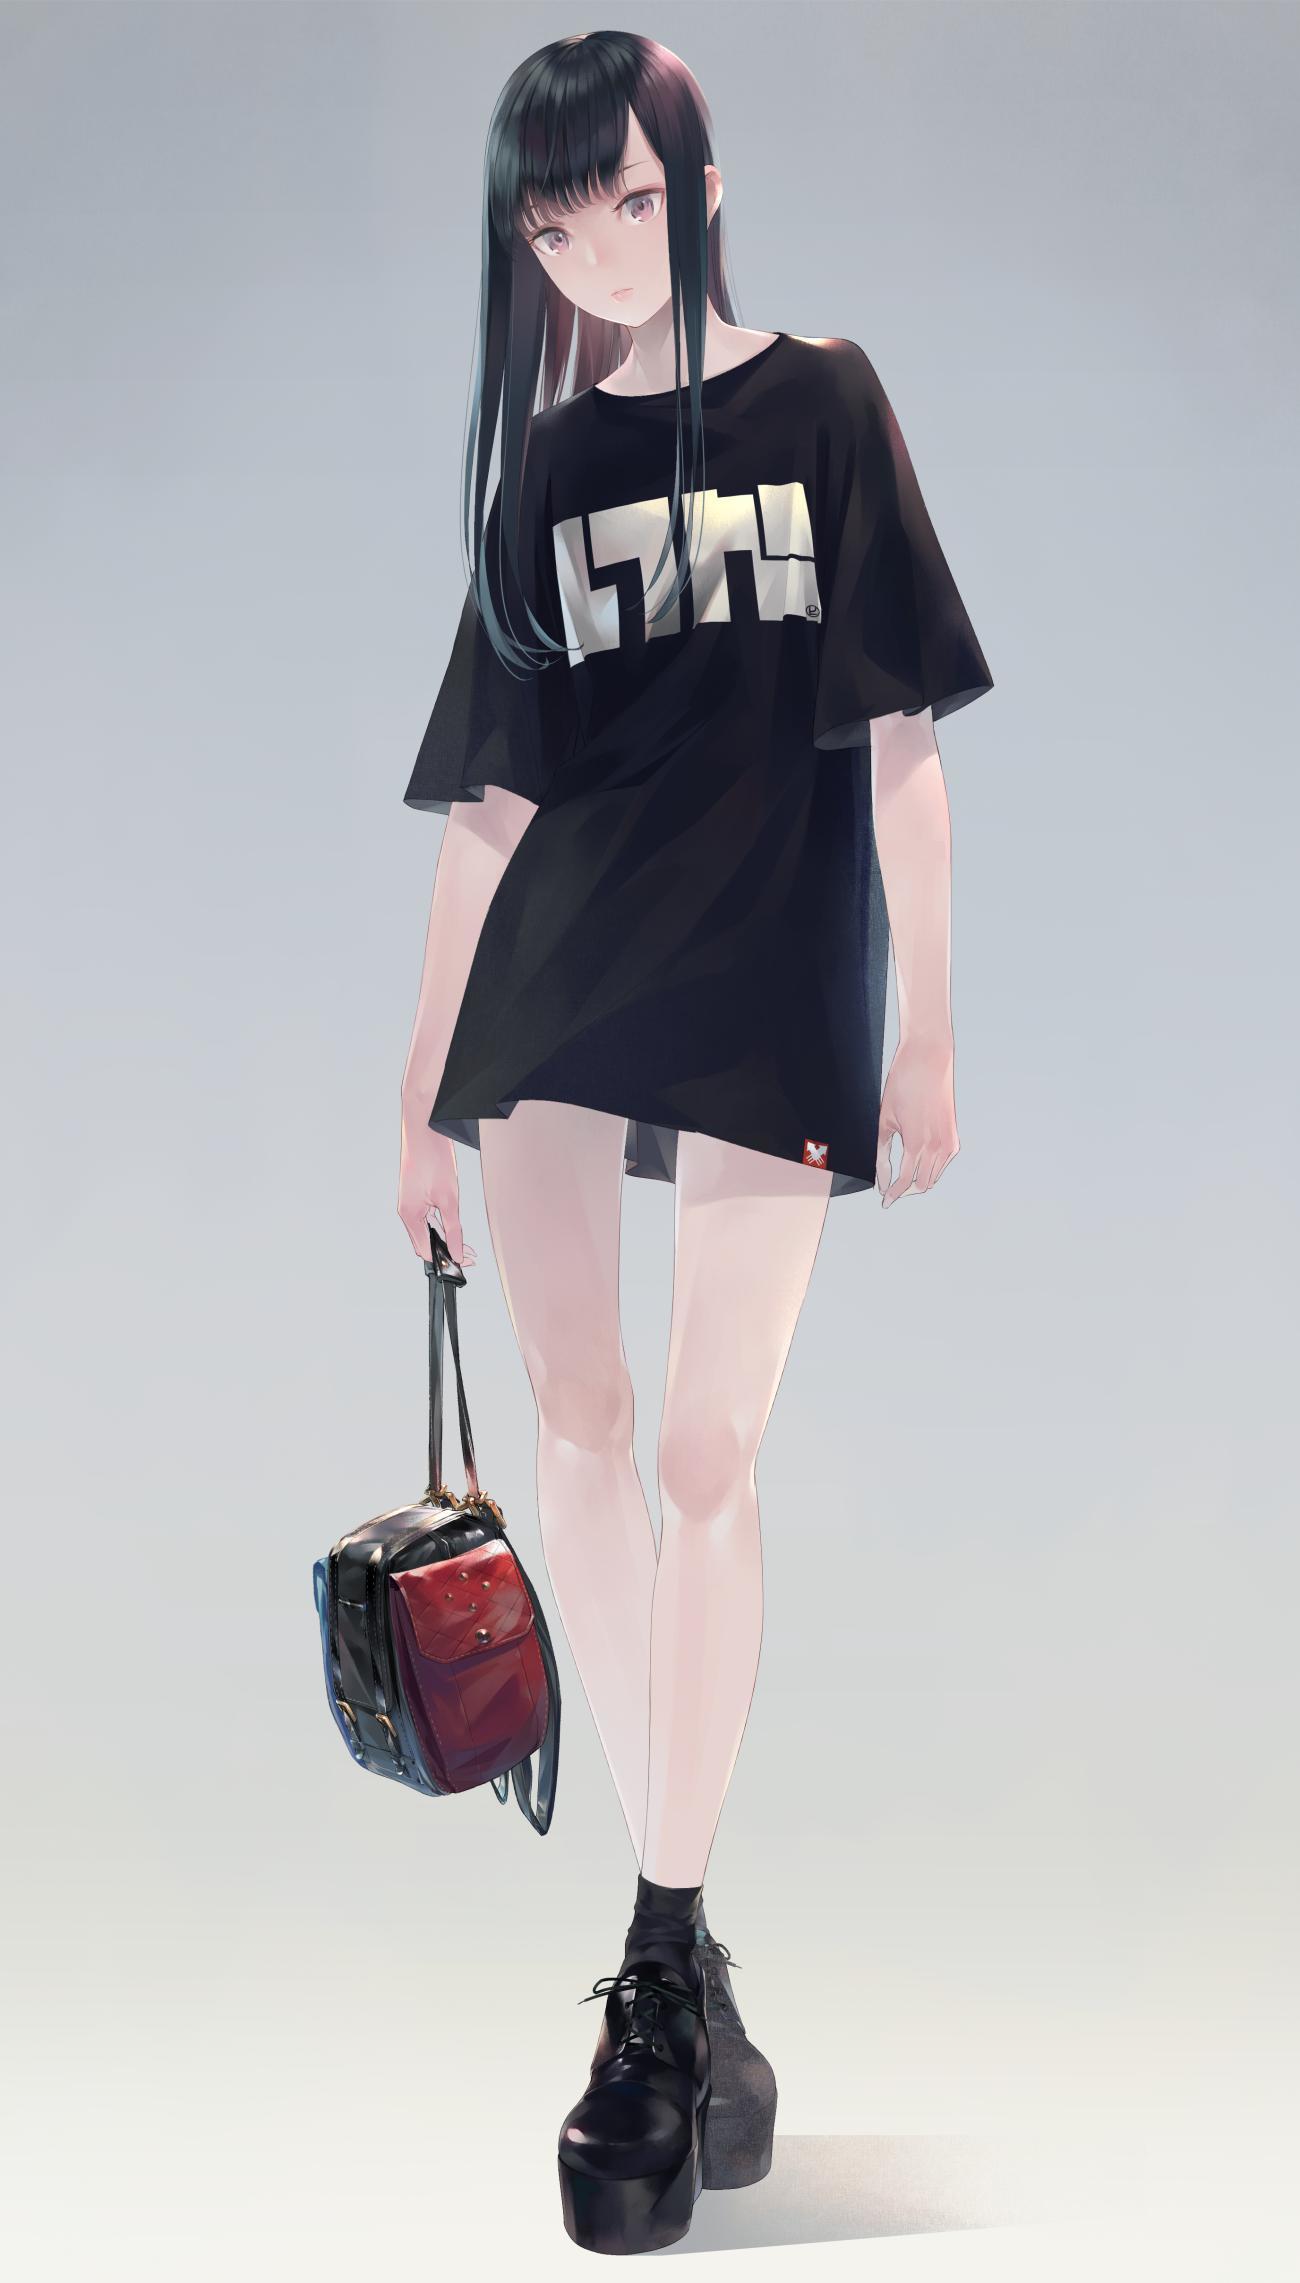 P站画师作品T和Switch帆布背包